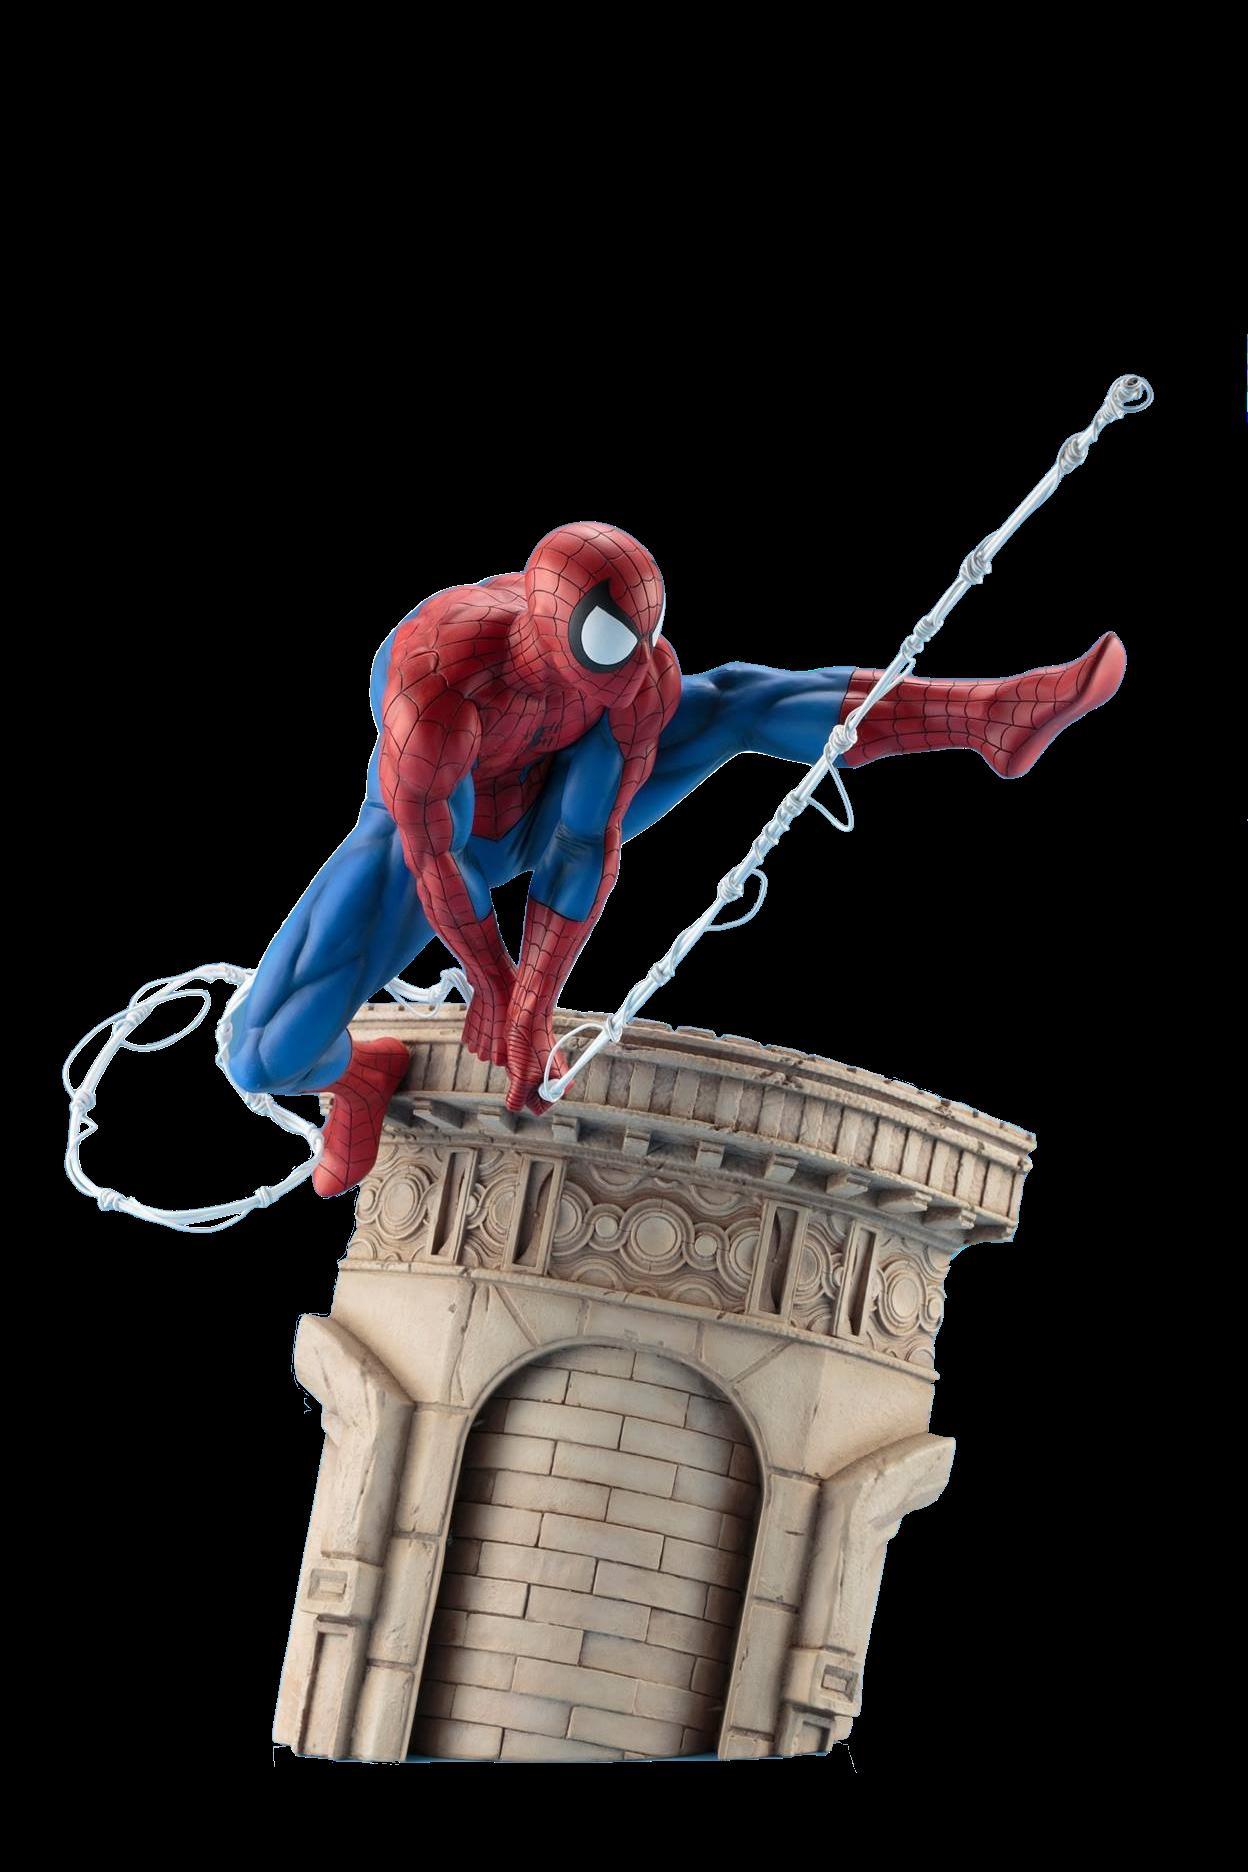 kotobukiya-marvel-spiderman-webslinger-artfx-statue-toyslife